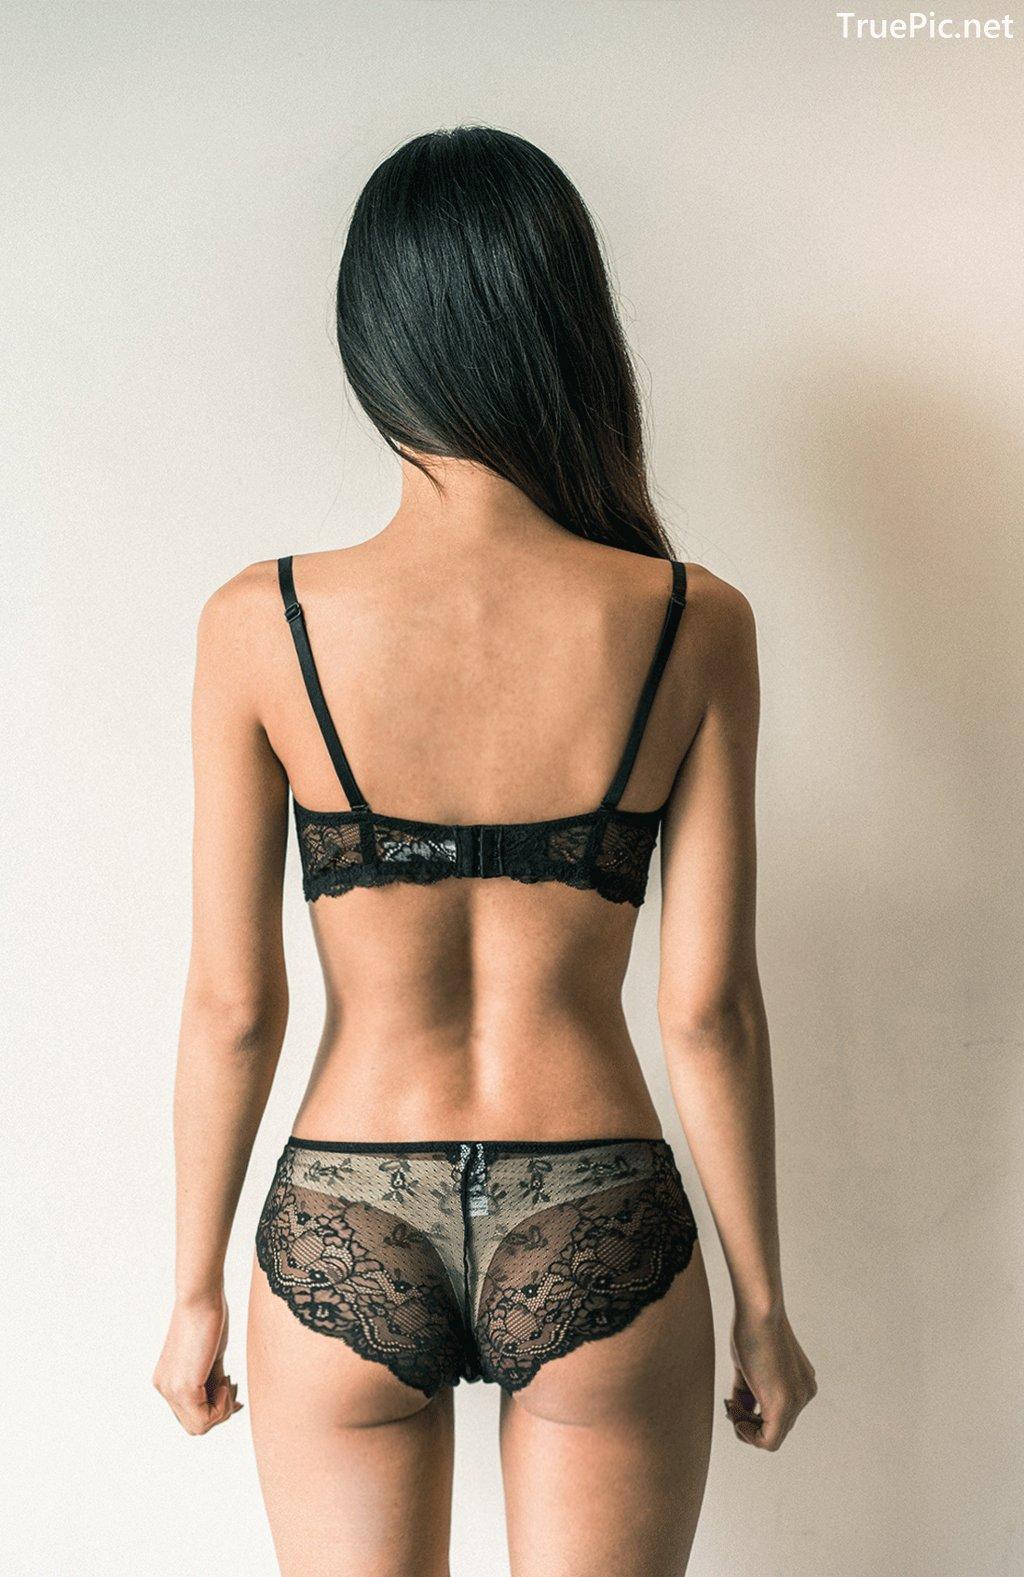 Image Korean Fashion Model – Baek Ye Jin – Sexy Lingerie Collection #3 - TruePic.net - Picture-4